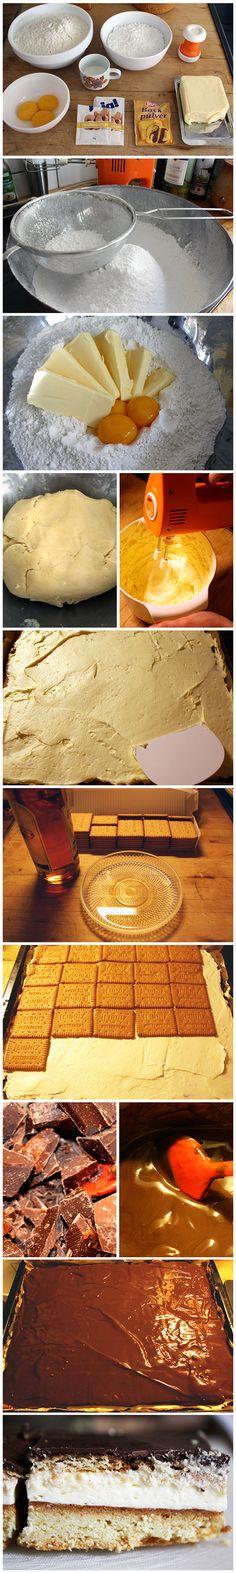 LPG-Kuchen | Rezepte aus der DDR Rezept auf www.zsa-zsa-zsu.de #yammi #foodporn #backen #kuchen #butterkeks